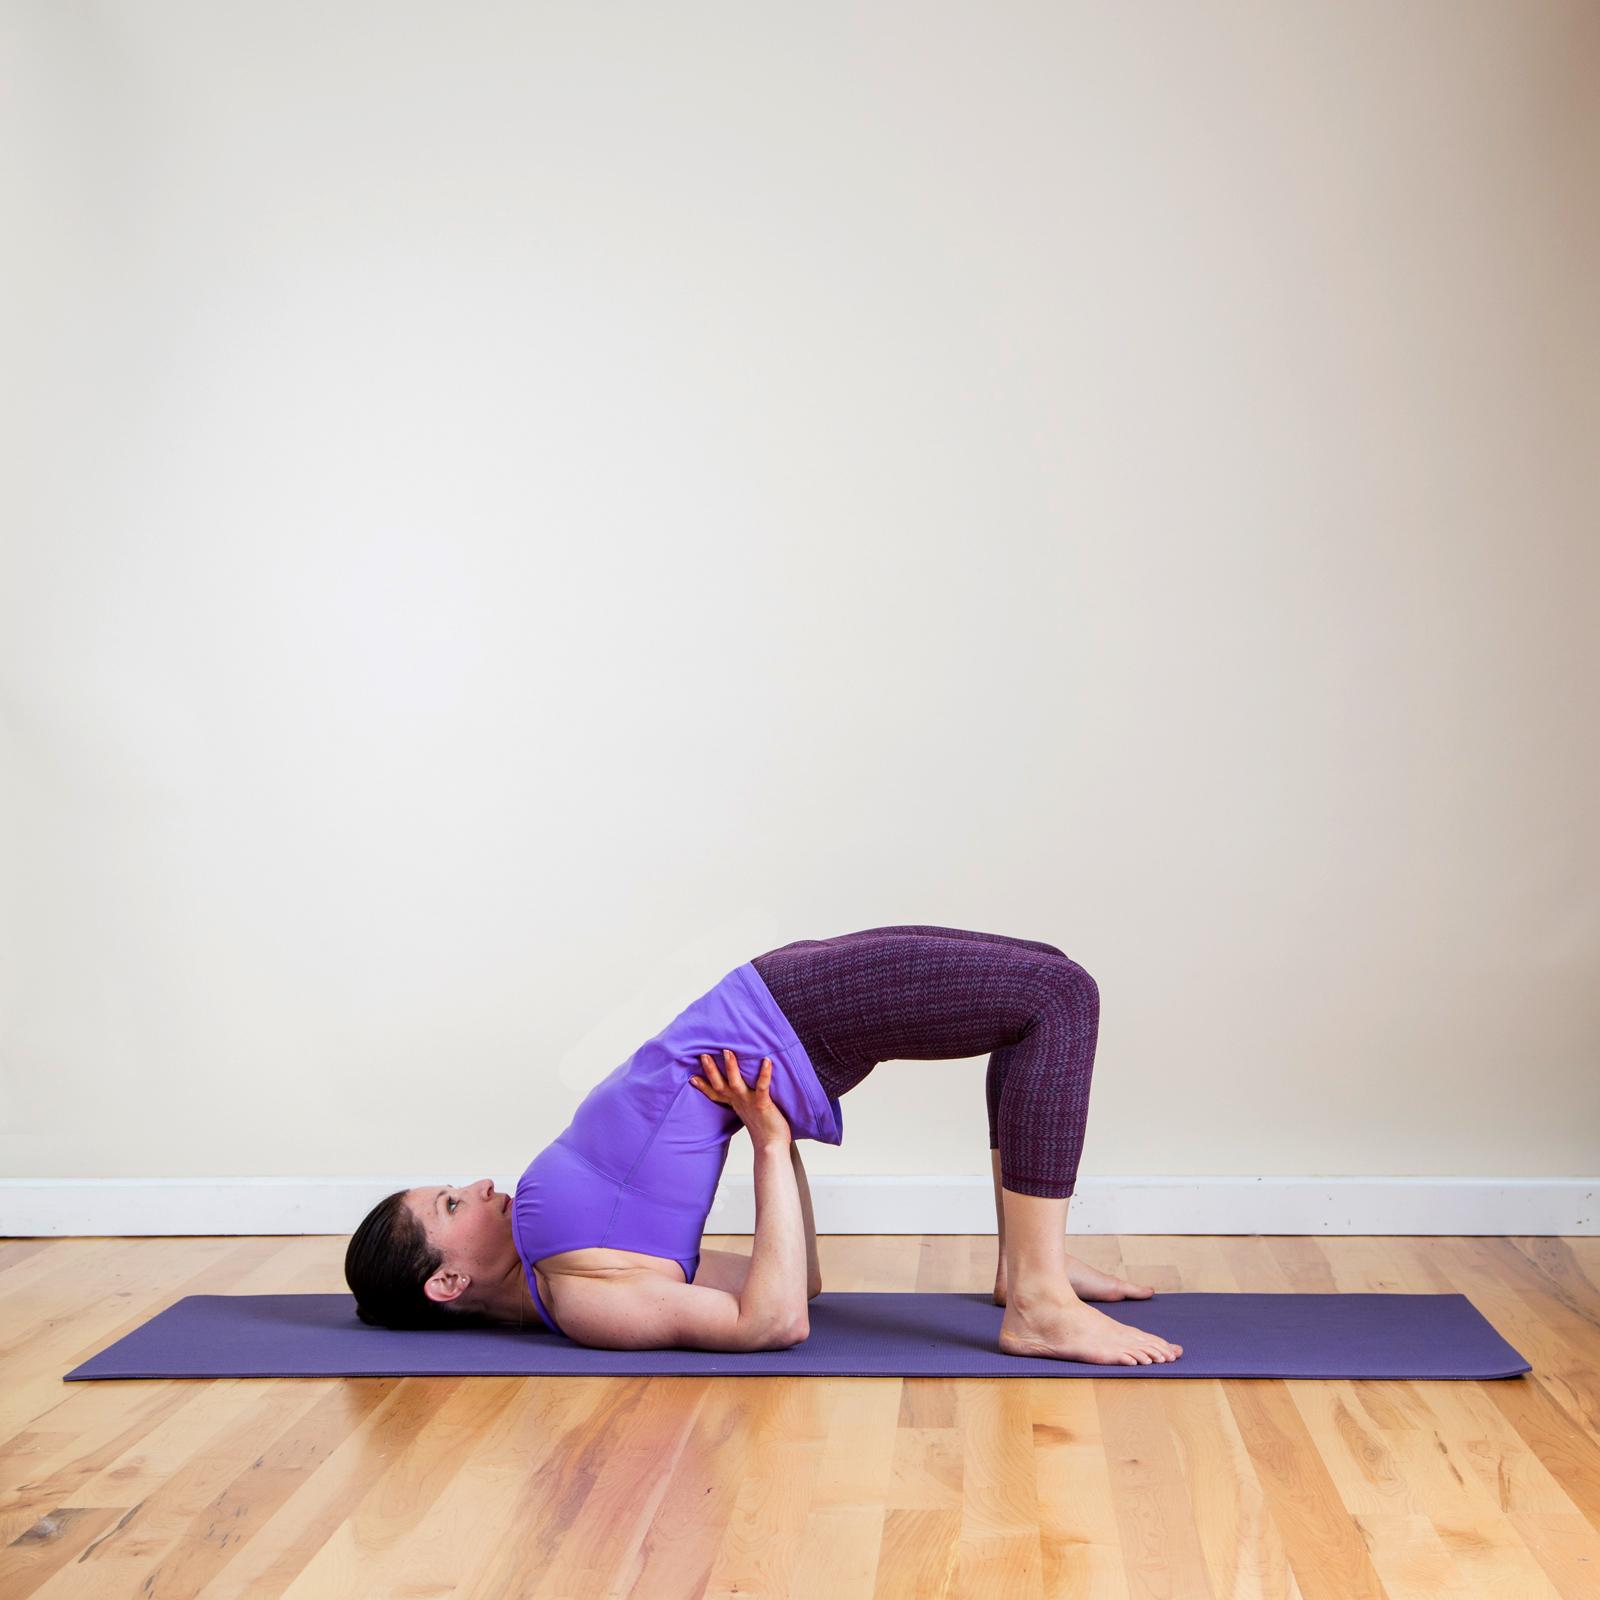 Yoga Pose 6: Half Wheel